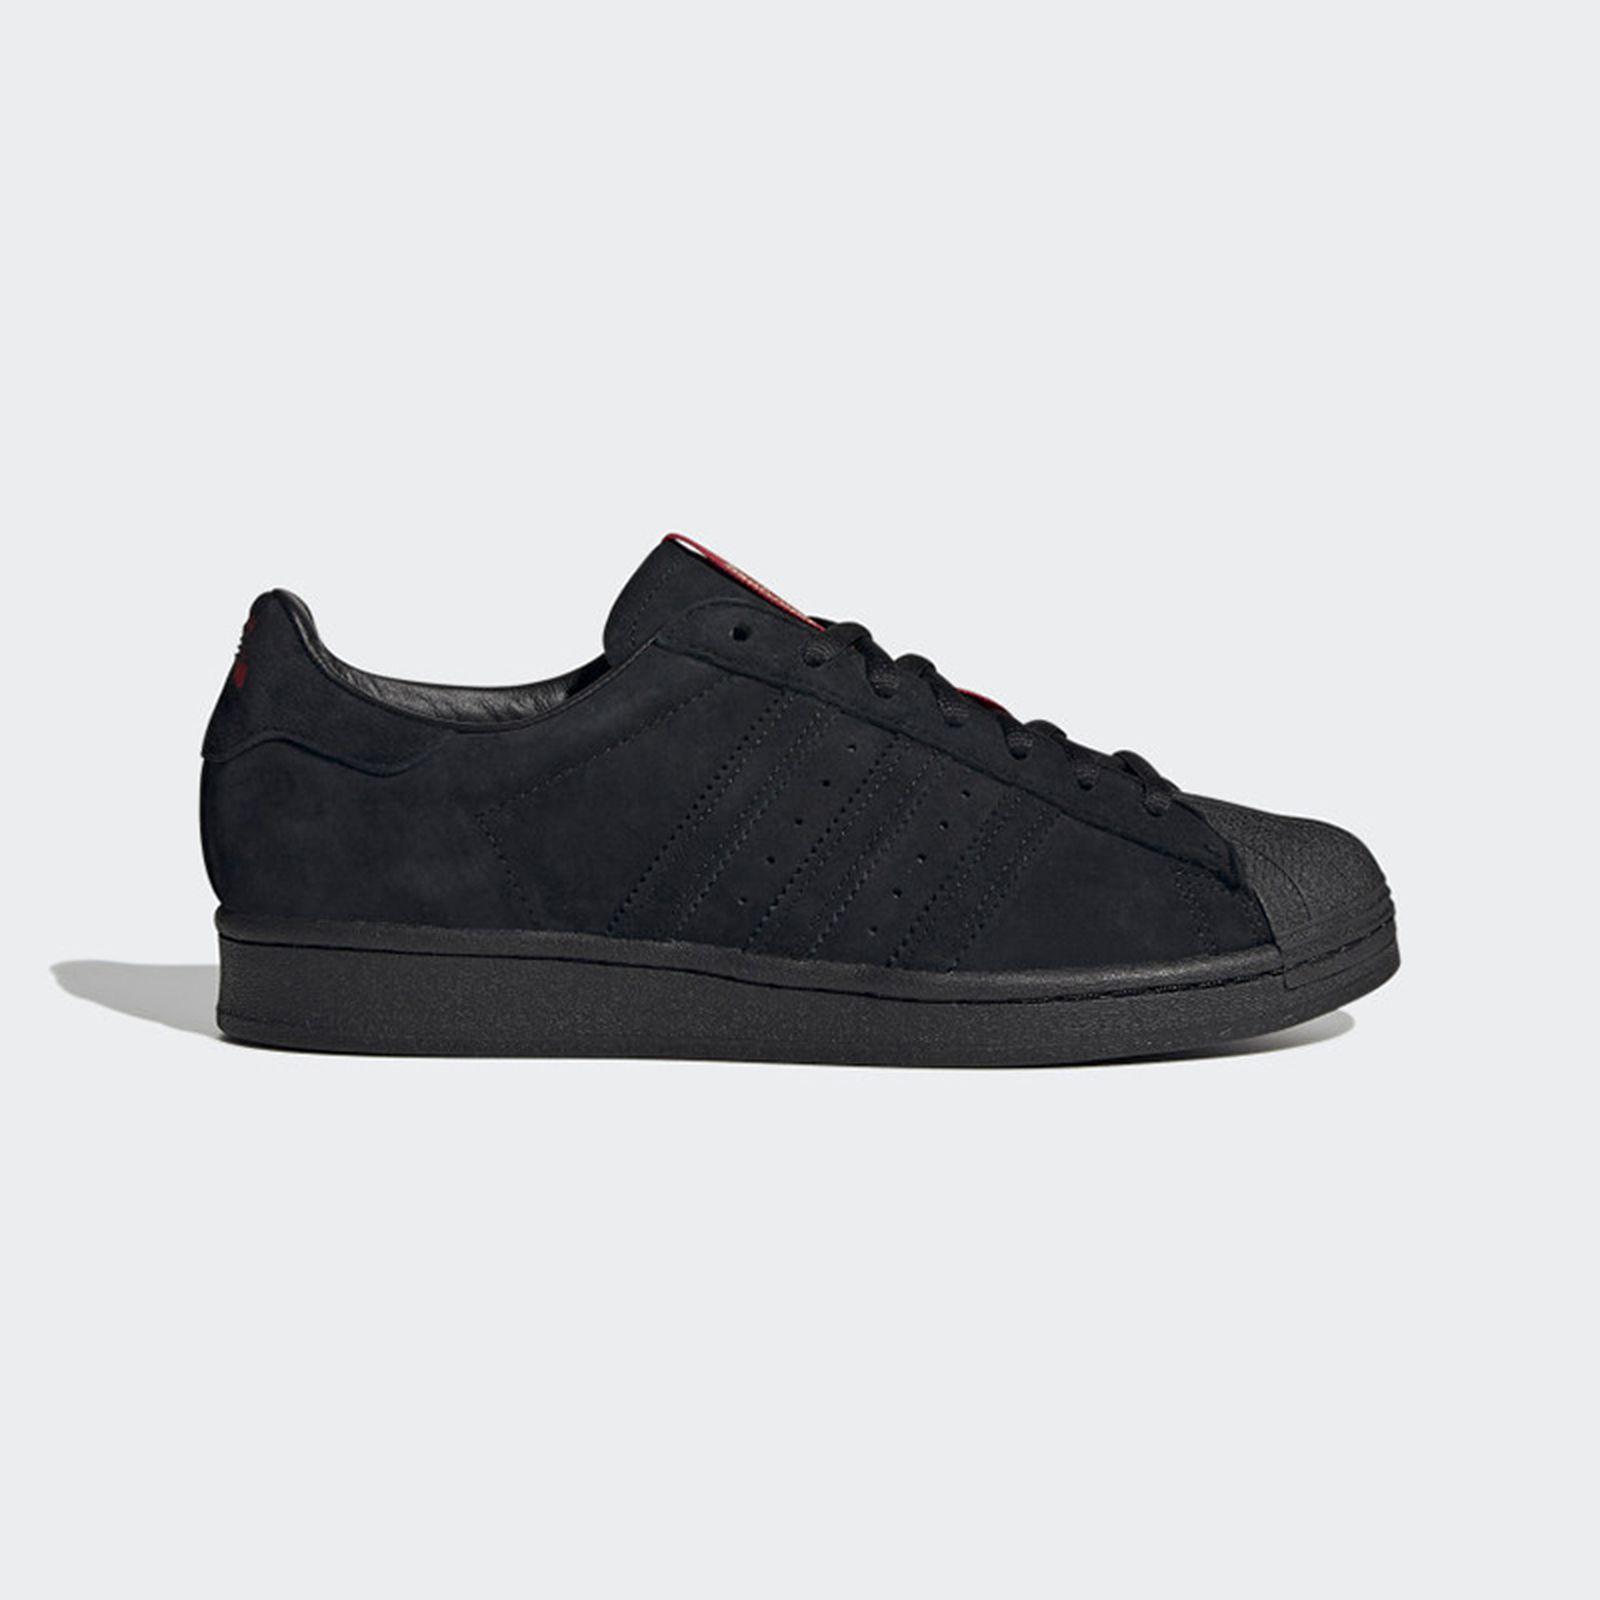 thrasher-adidas-superstar-adv-tyshawn-jones-release-date-price-1-01